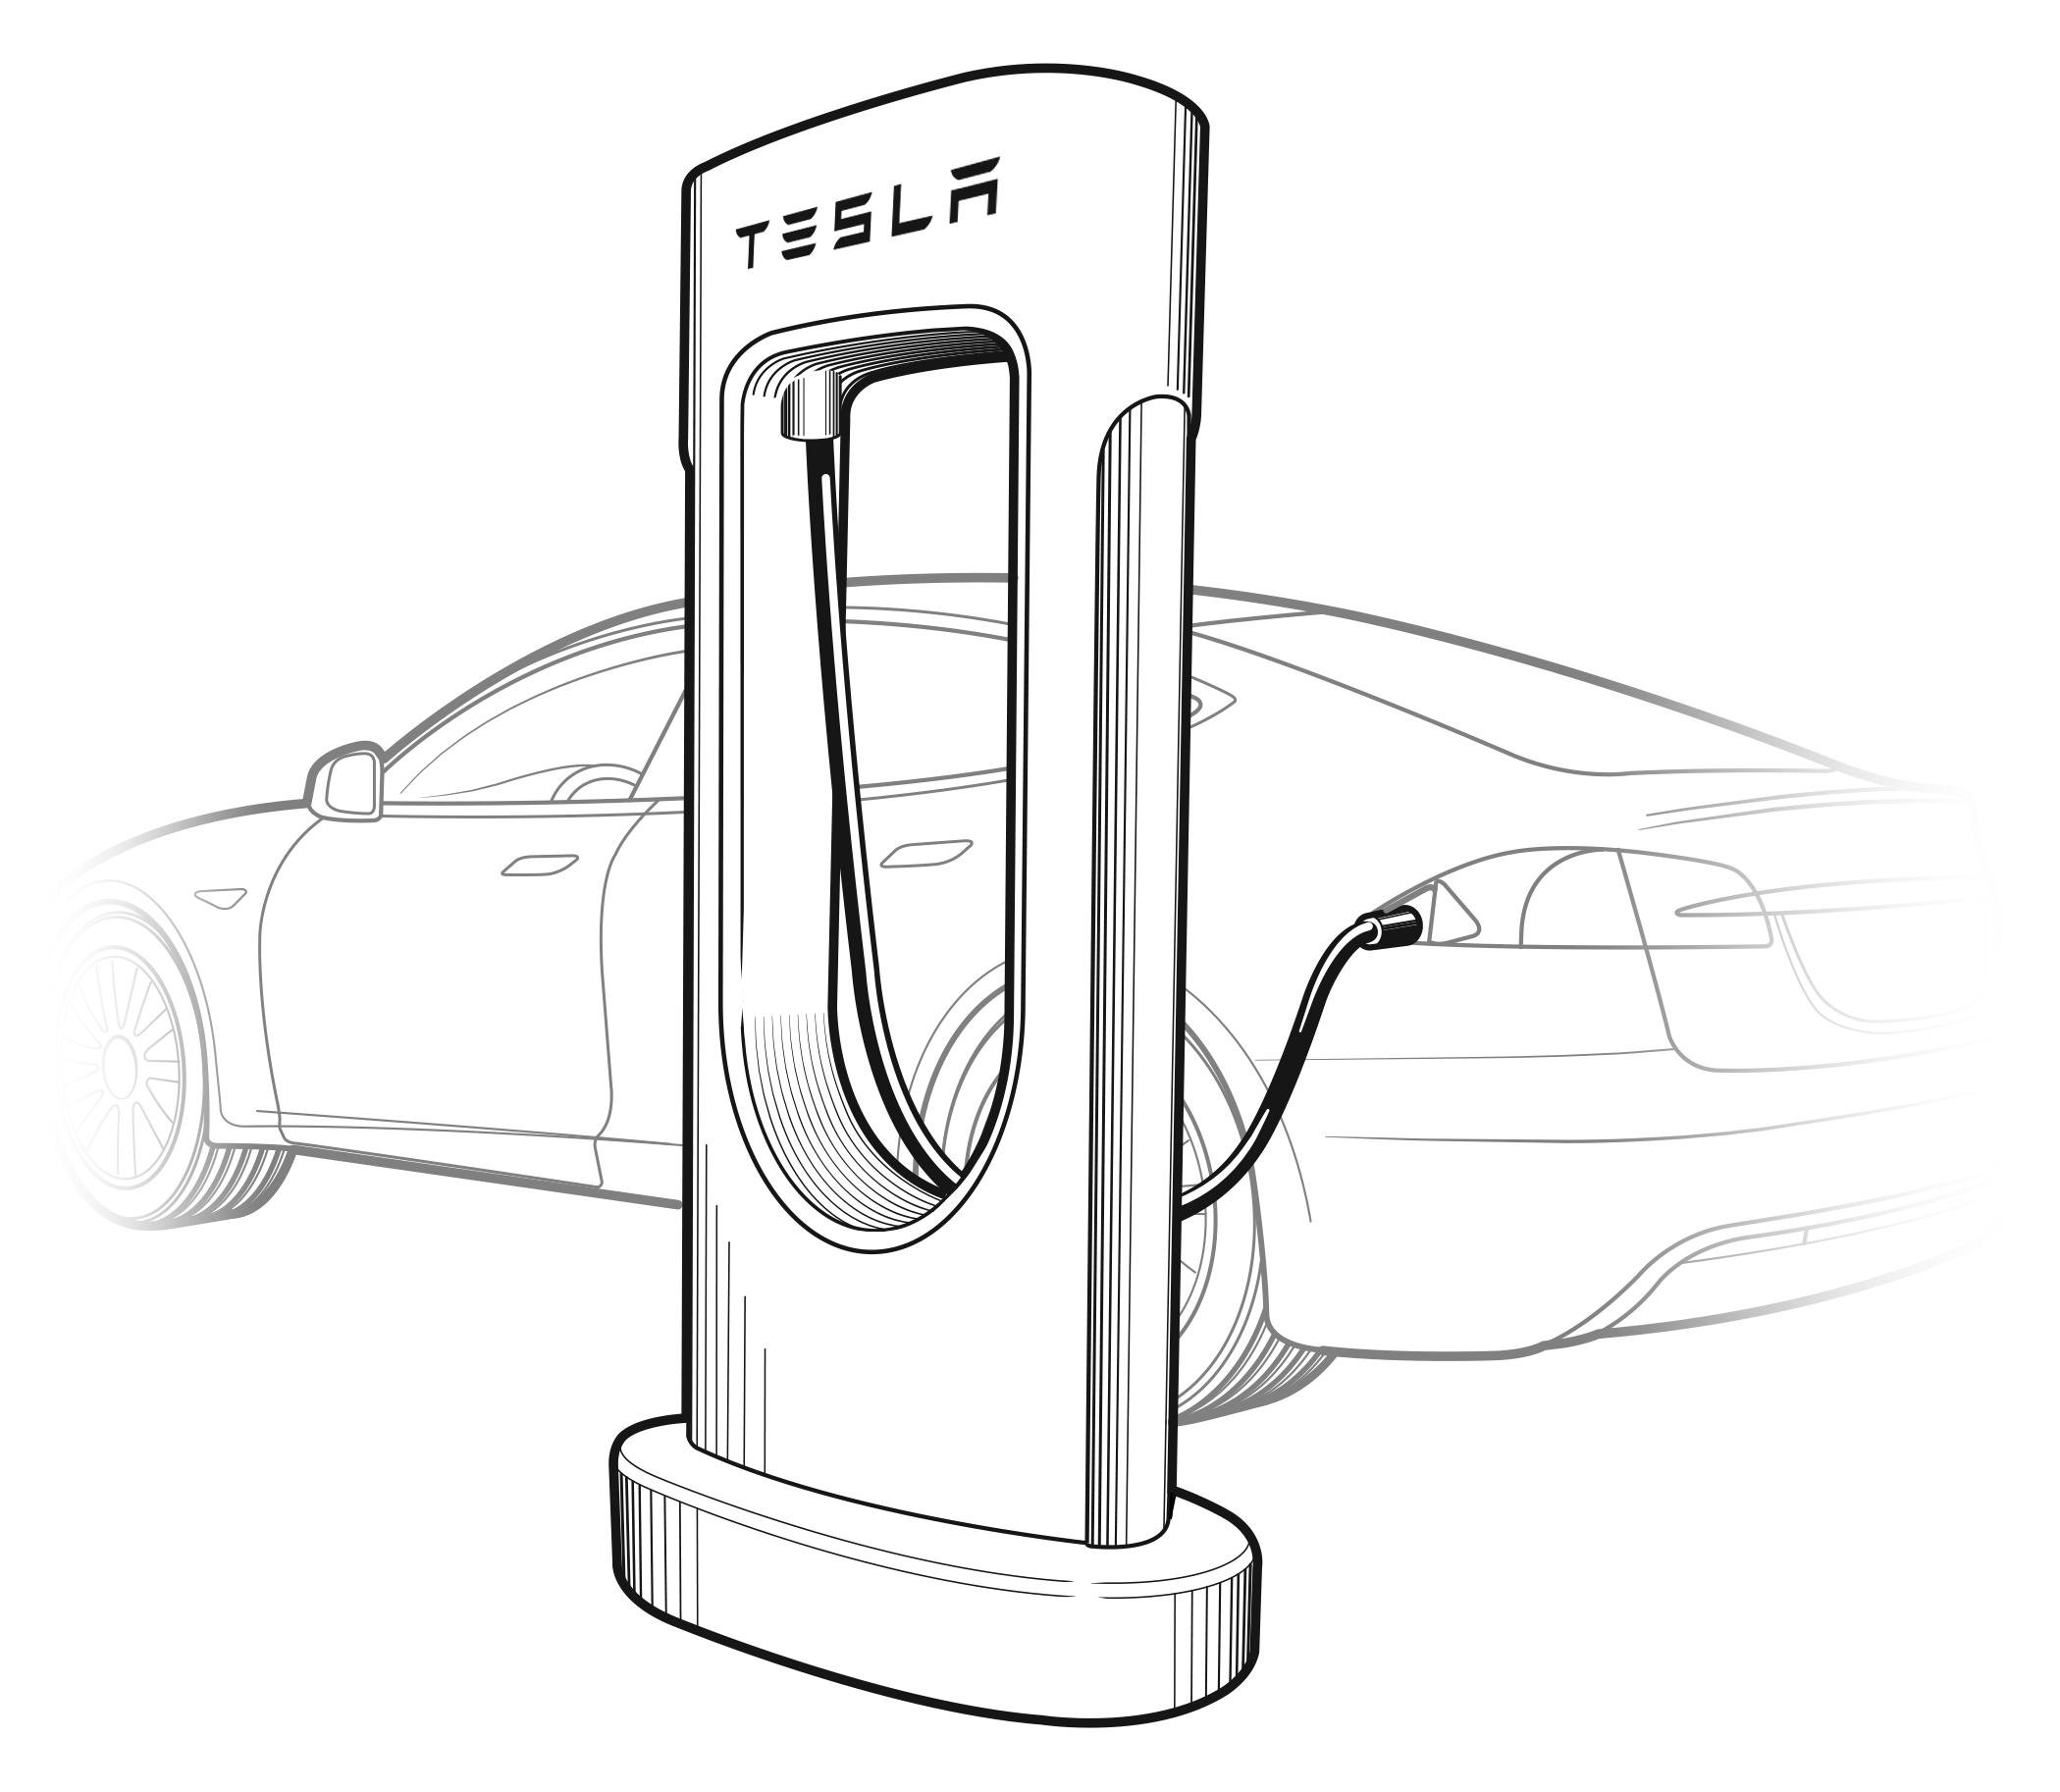 Popular Mechanics  Tesla Supercharger